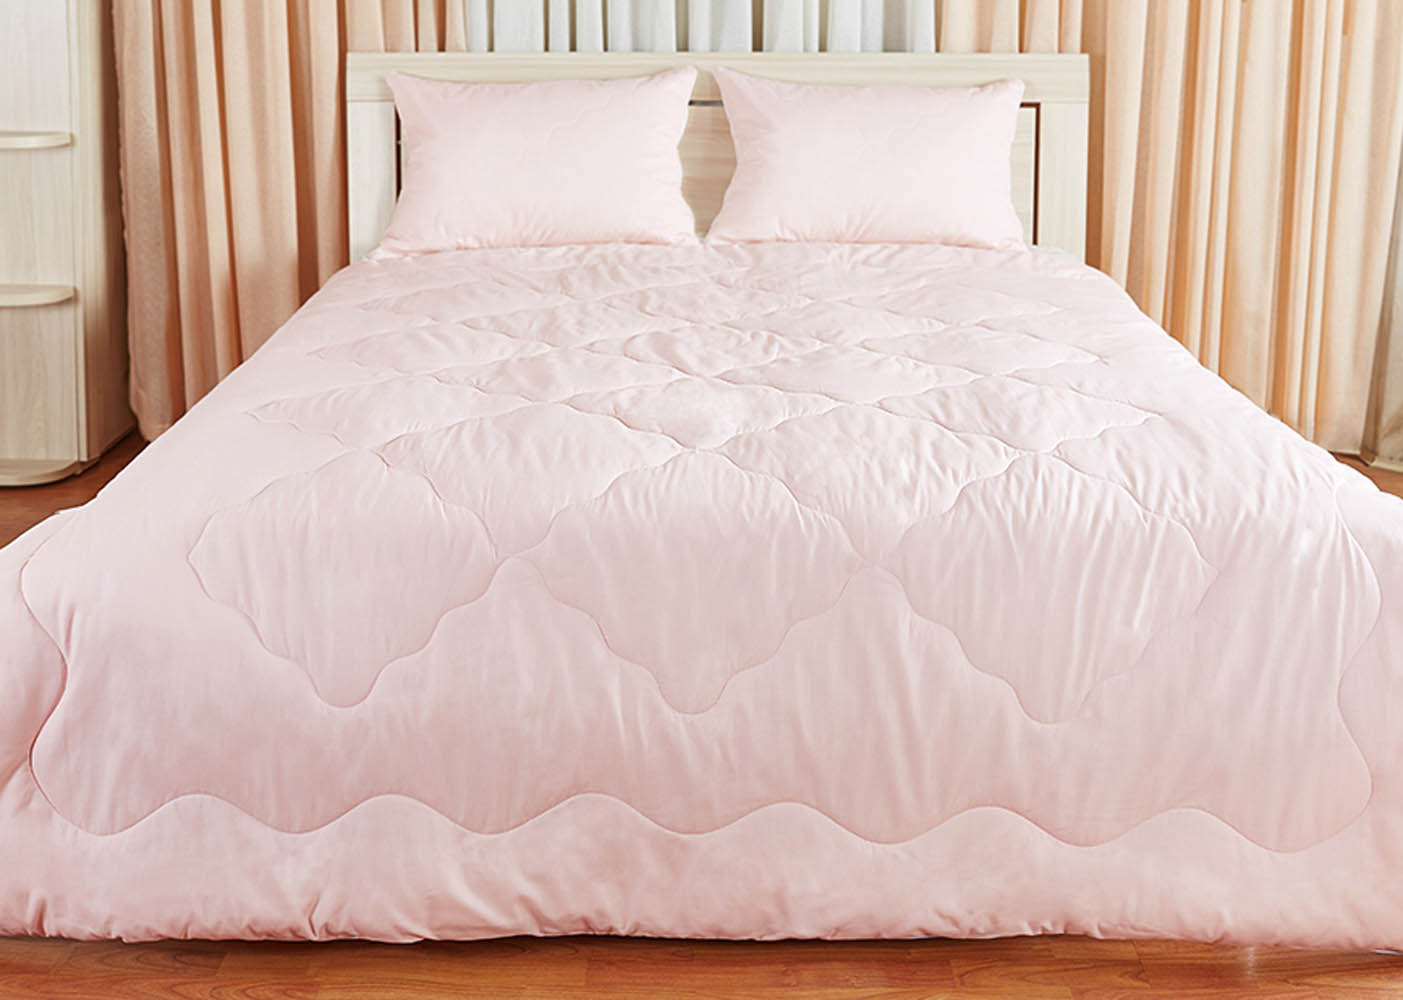 Одеяла Primavelle Одеяло Lavander Цвет: Розовый (172х205 см) лак для ногтей beautydrugs scented nail polish lavander цвет lavander variant hex name 9378ad